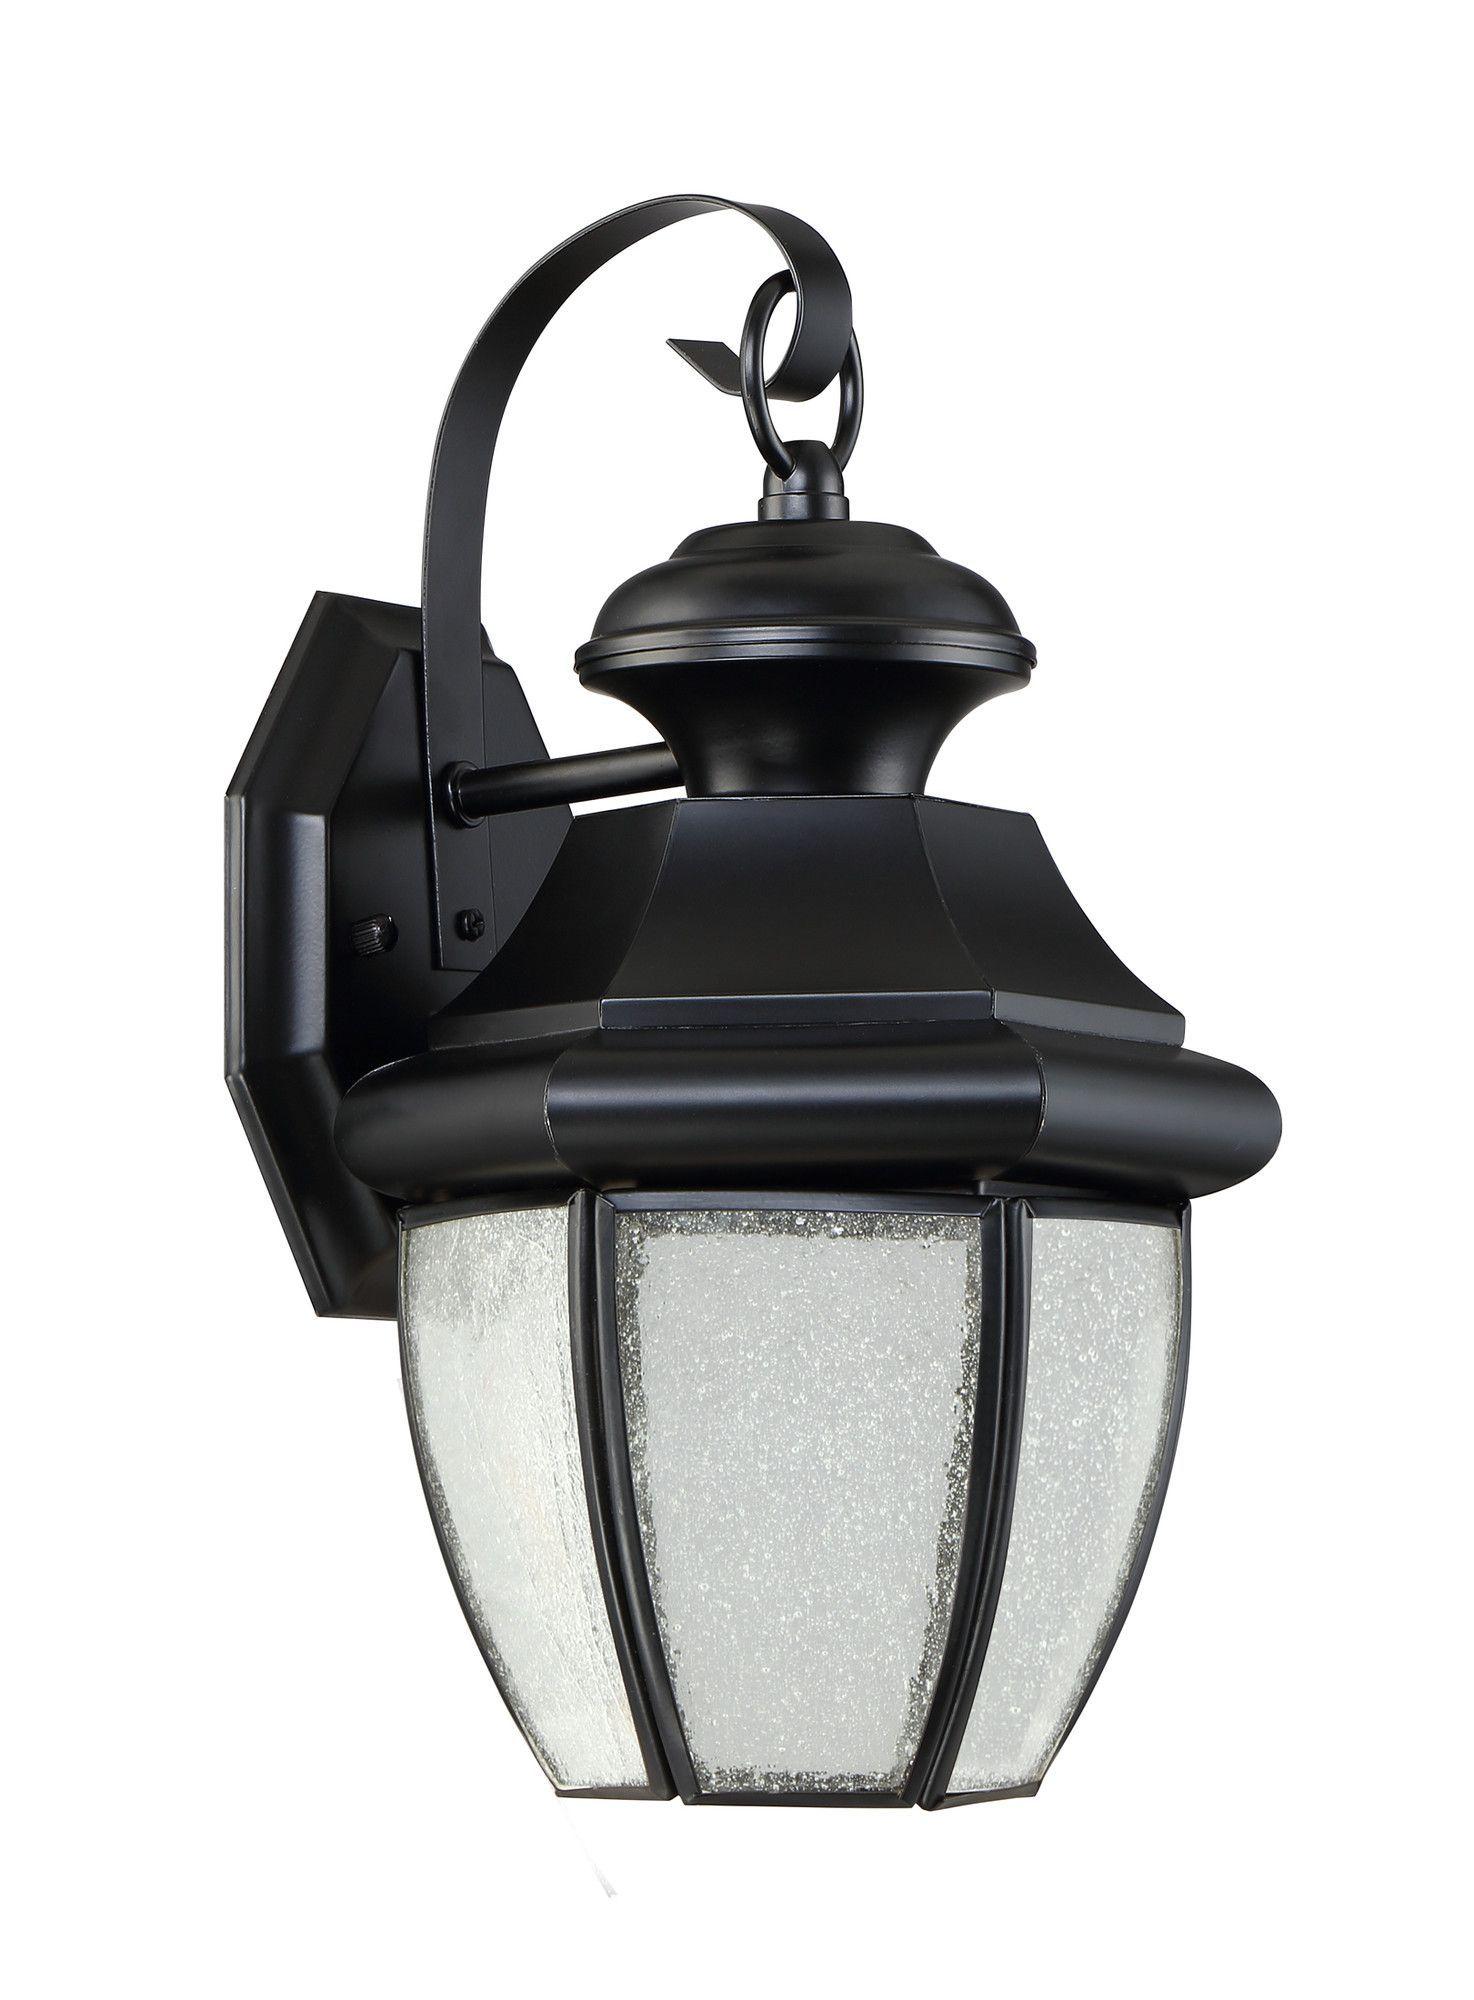 Saddler light outdoor wall lantern products pinterest